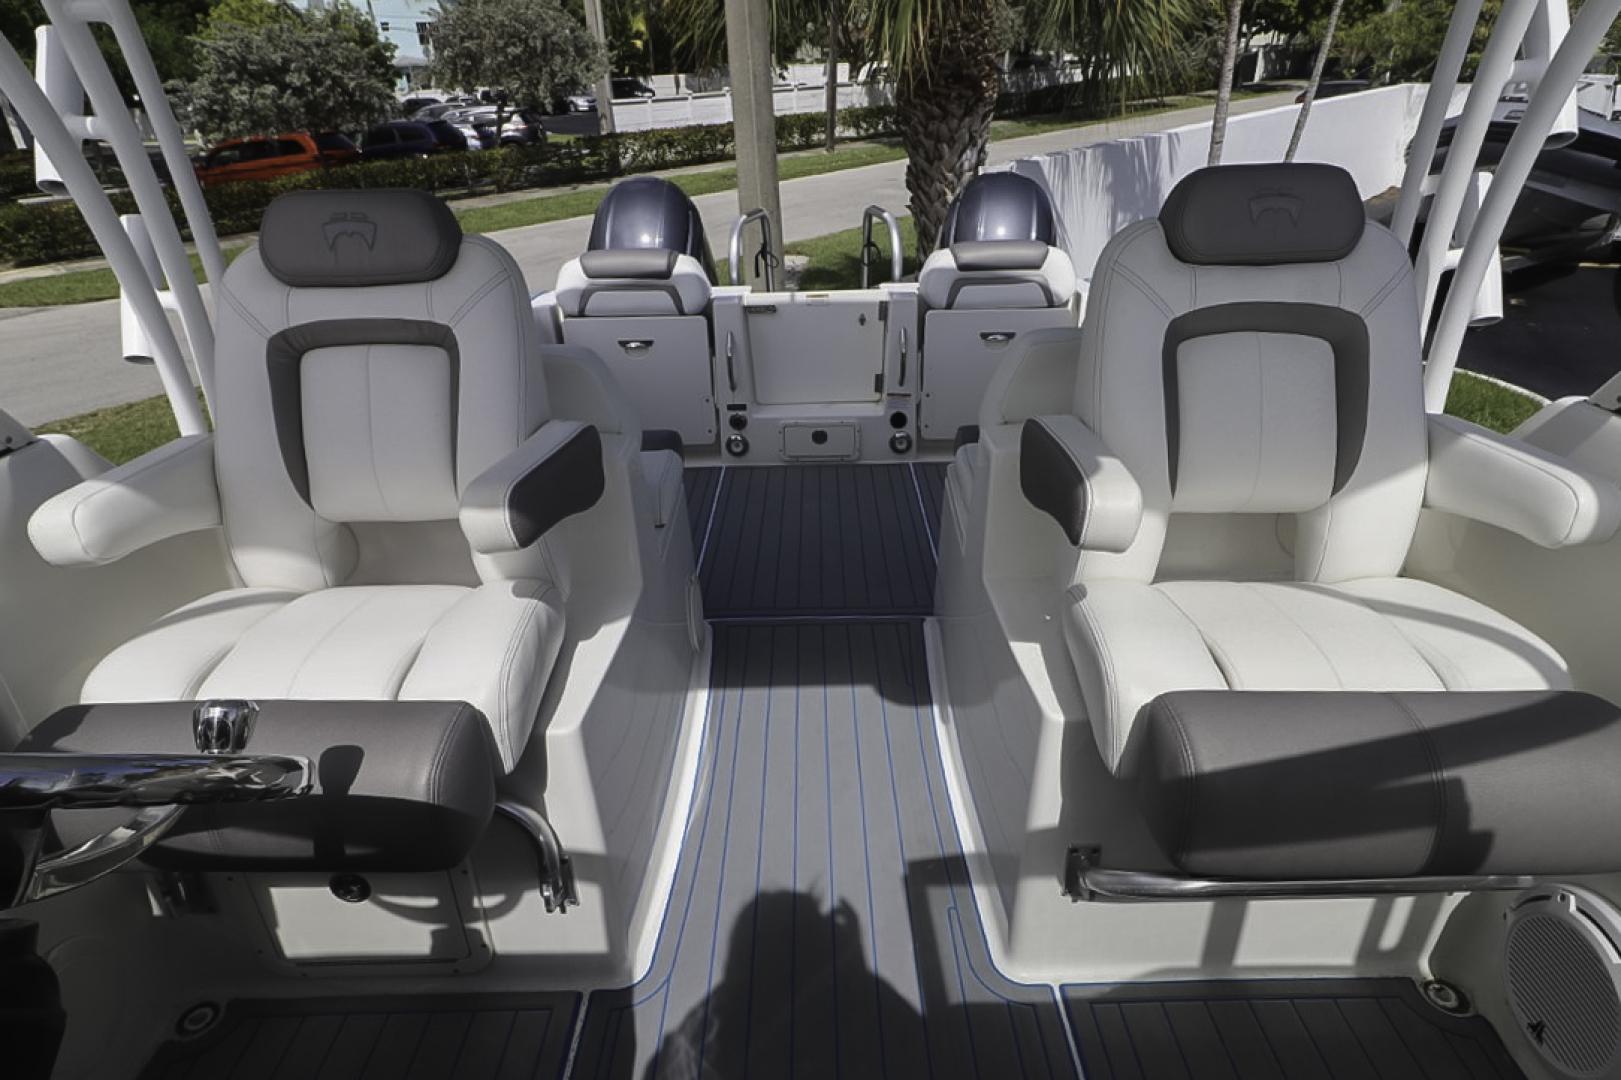 World Cat-255 DC 2019 -Palm Beach-Florida-United States-1631206 | Thumbnail